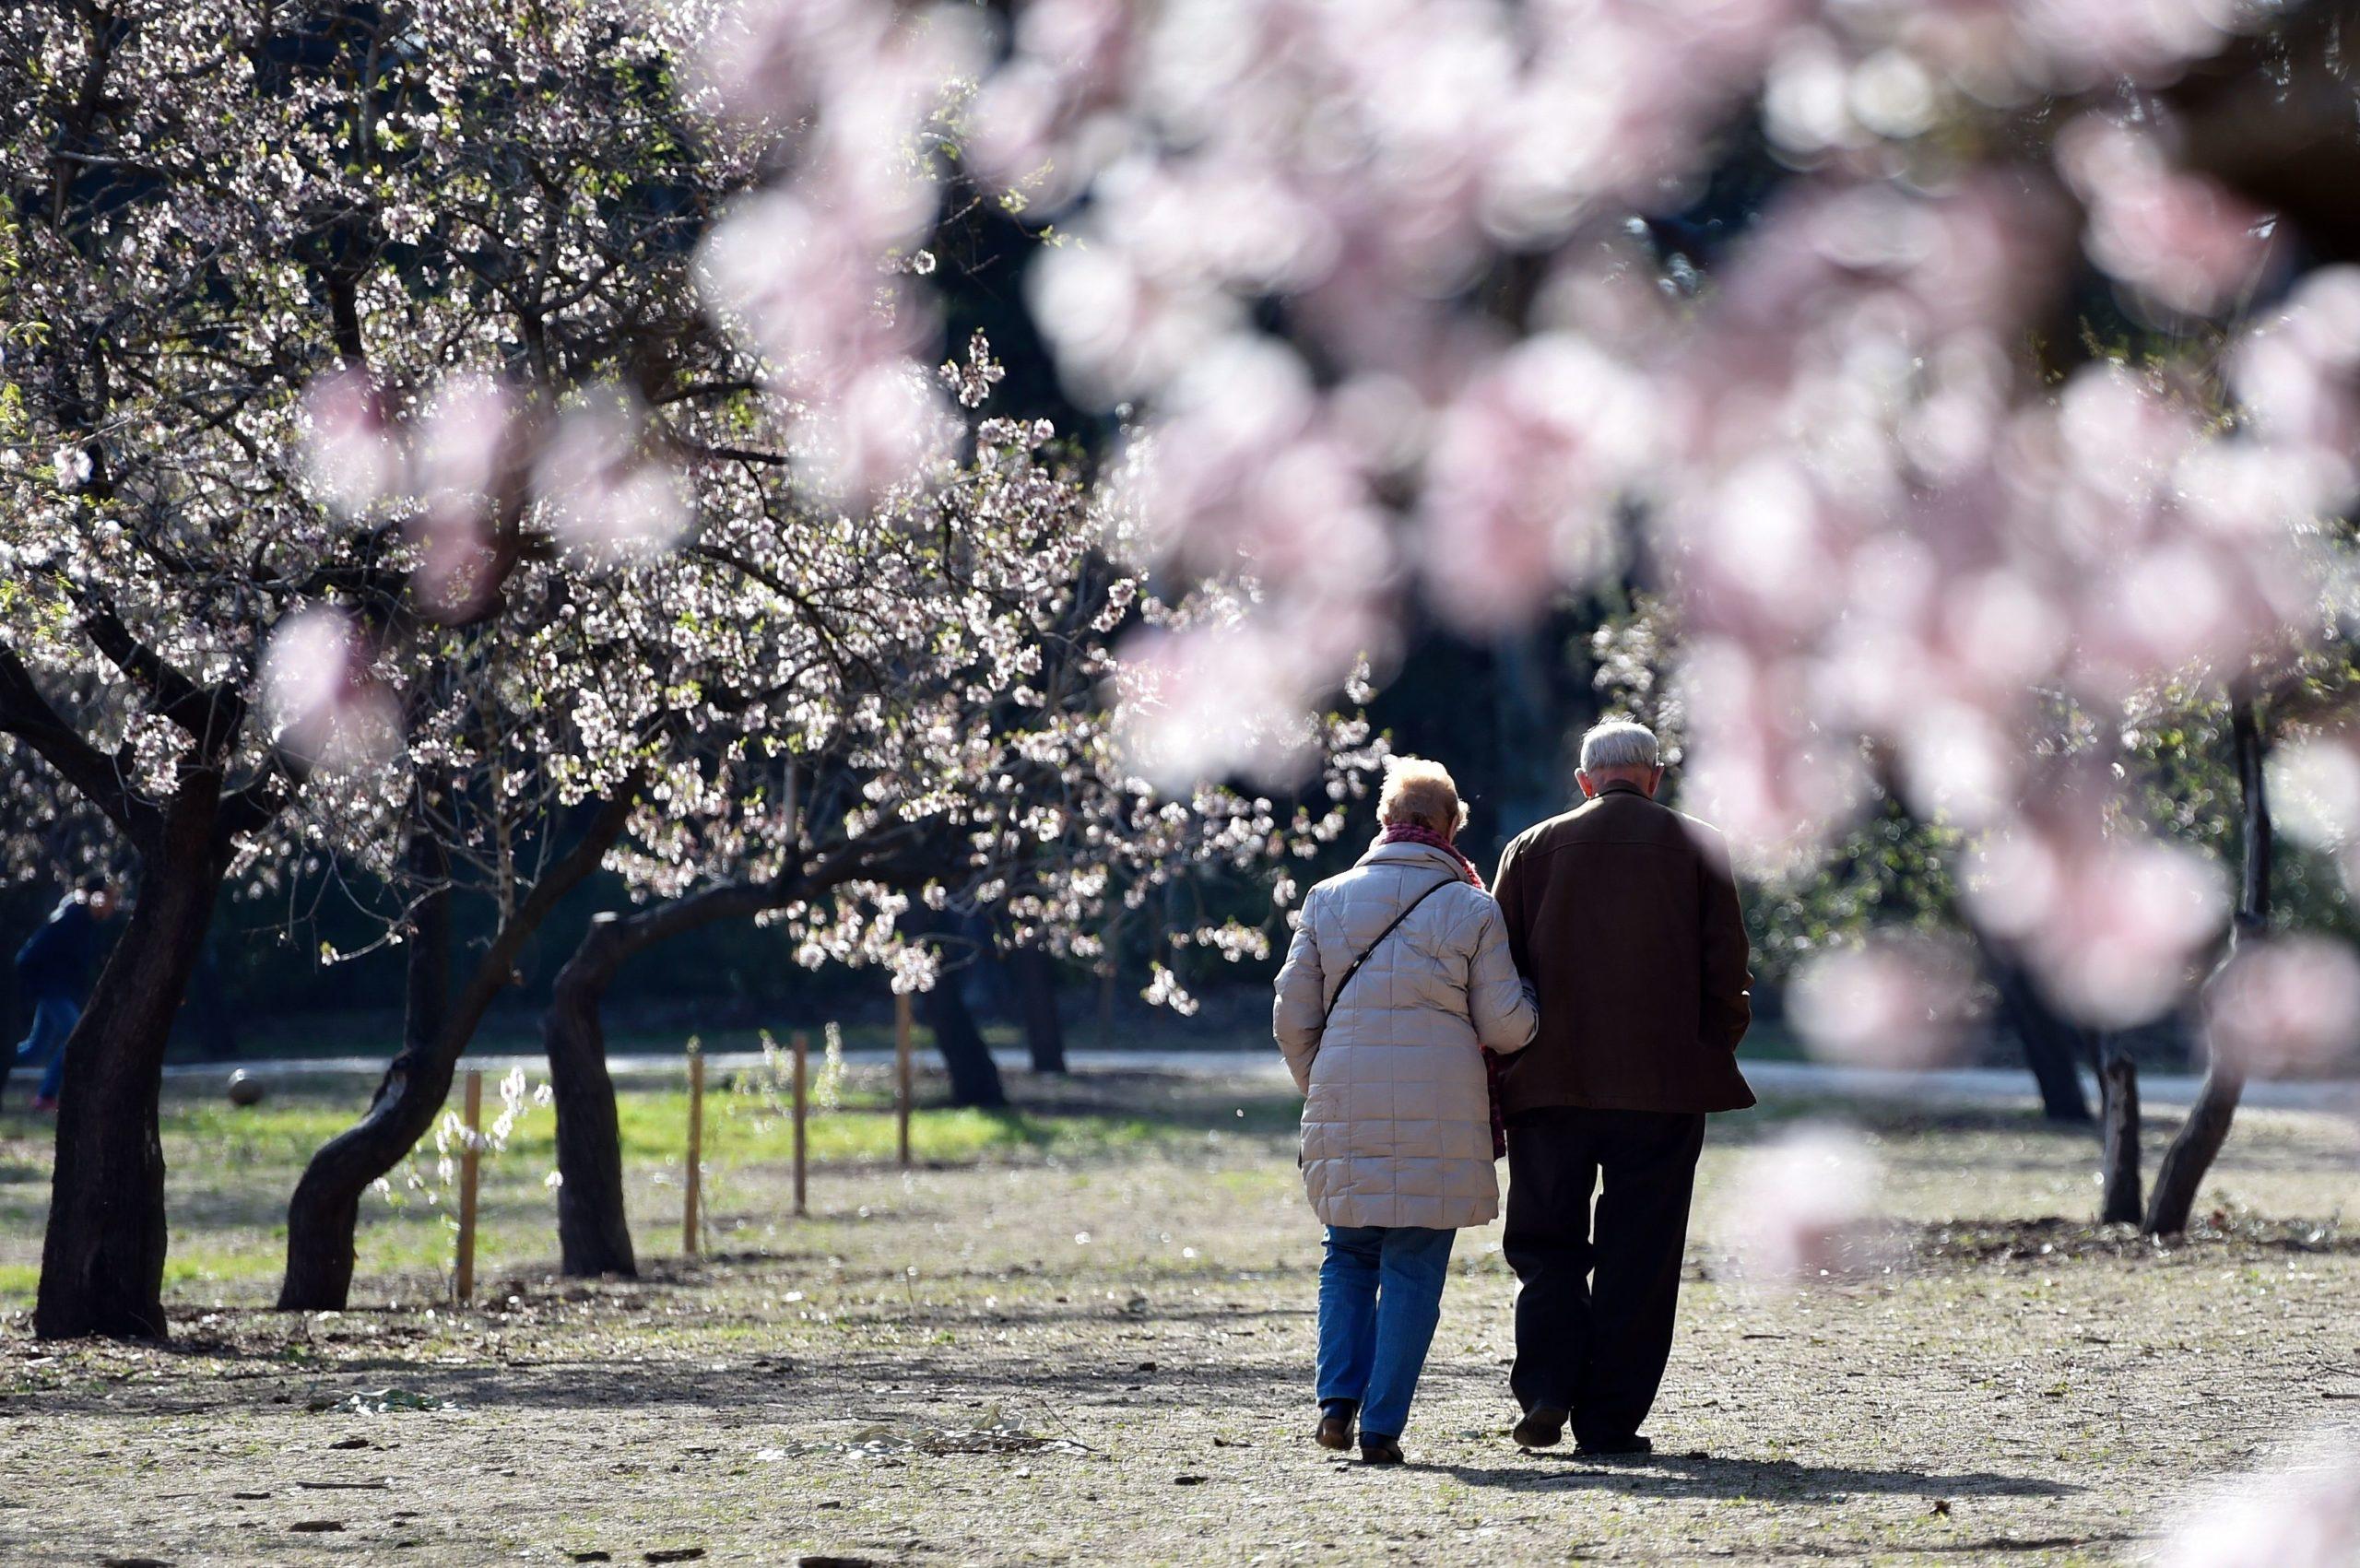 An elderly couple walks under blossoming almond trees at El Parque de Los Quintos in Madrid on March 12, 2016. / AFP / GERARD JULIEN (Photo credit should read GERARD JULIEN/AFP via Getty Images)